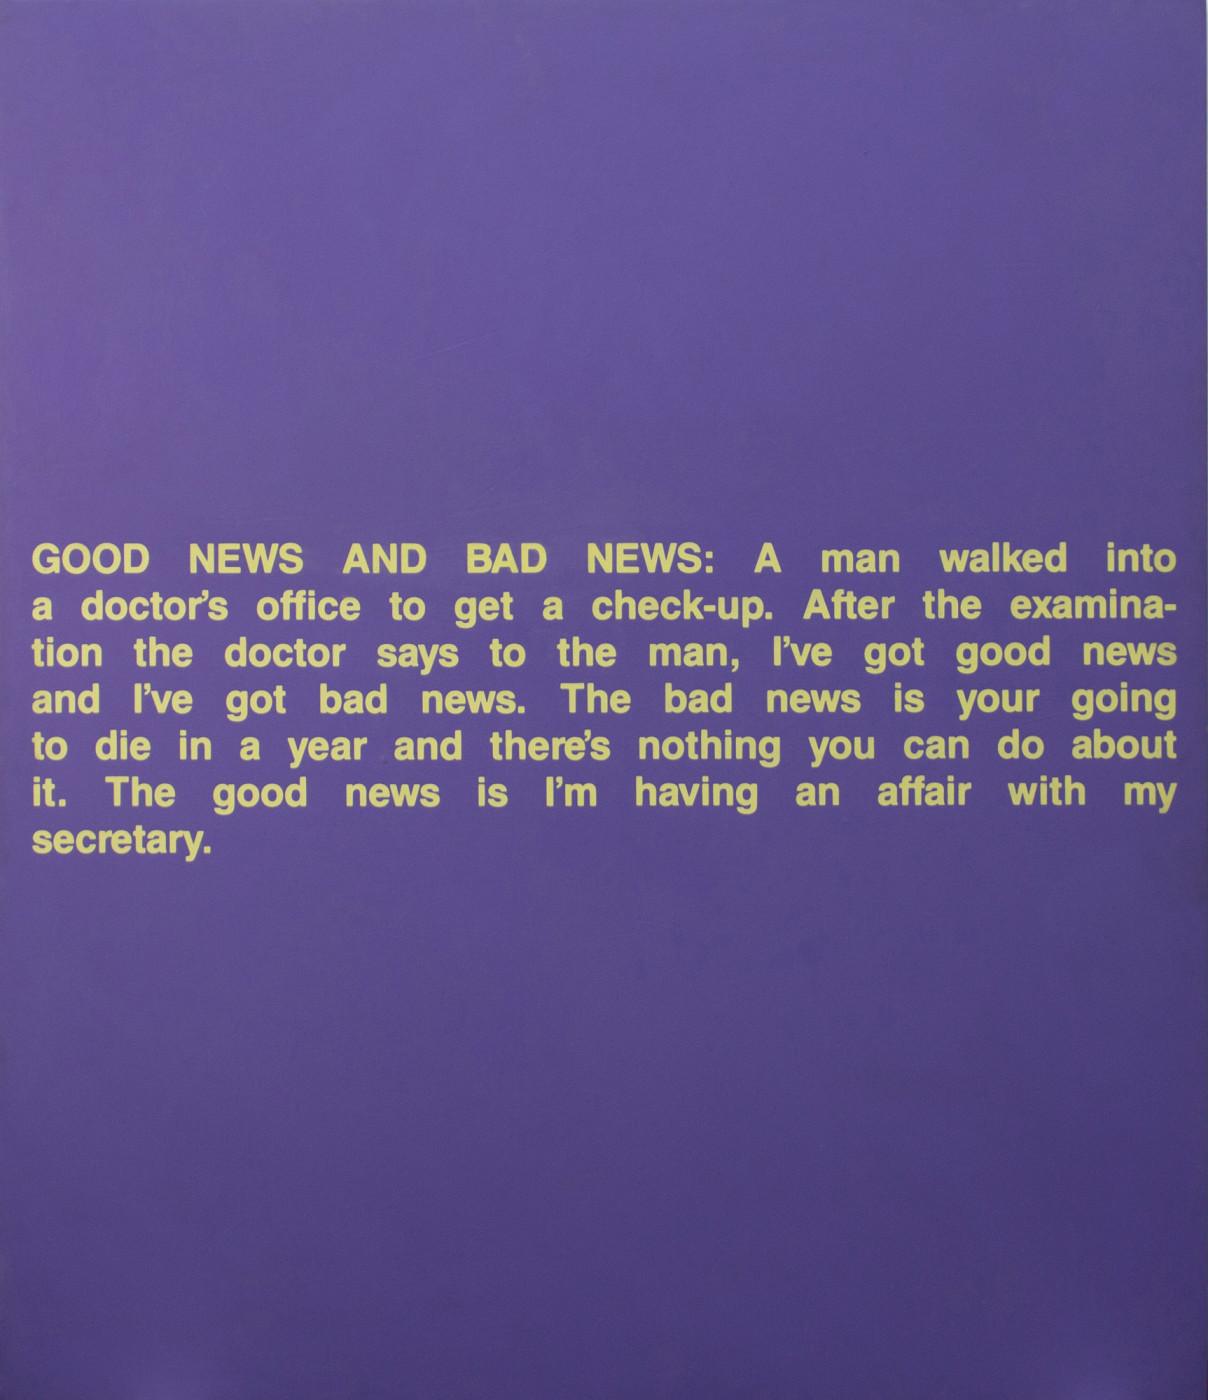 <div class=&#34;title&#34;><em>Good News, Bad News</em>, 1988</div><div class=&#34;medium&#34;>acrylic and silkscreen on canvas</div><div class=&#34;dimensions&#34;>142.24 x 121.92 cm<br />56 x 48 in.</div>